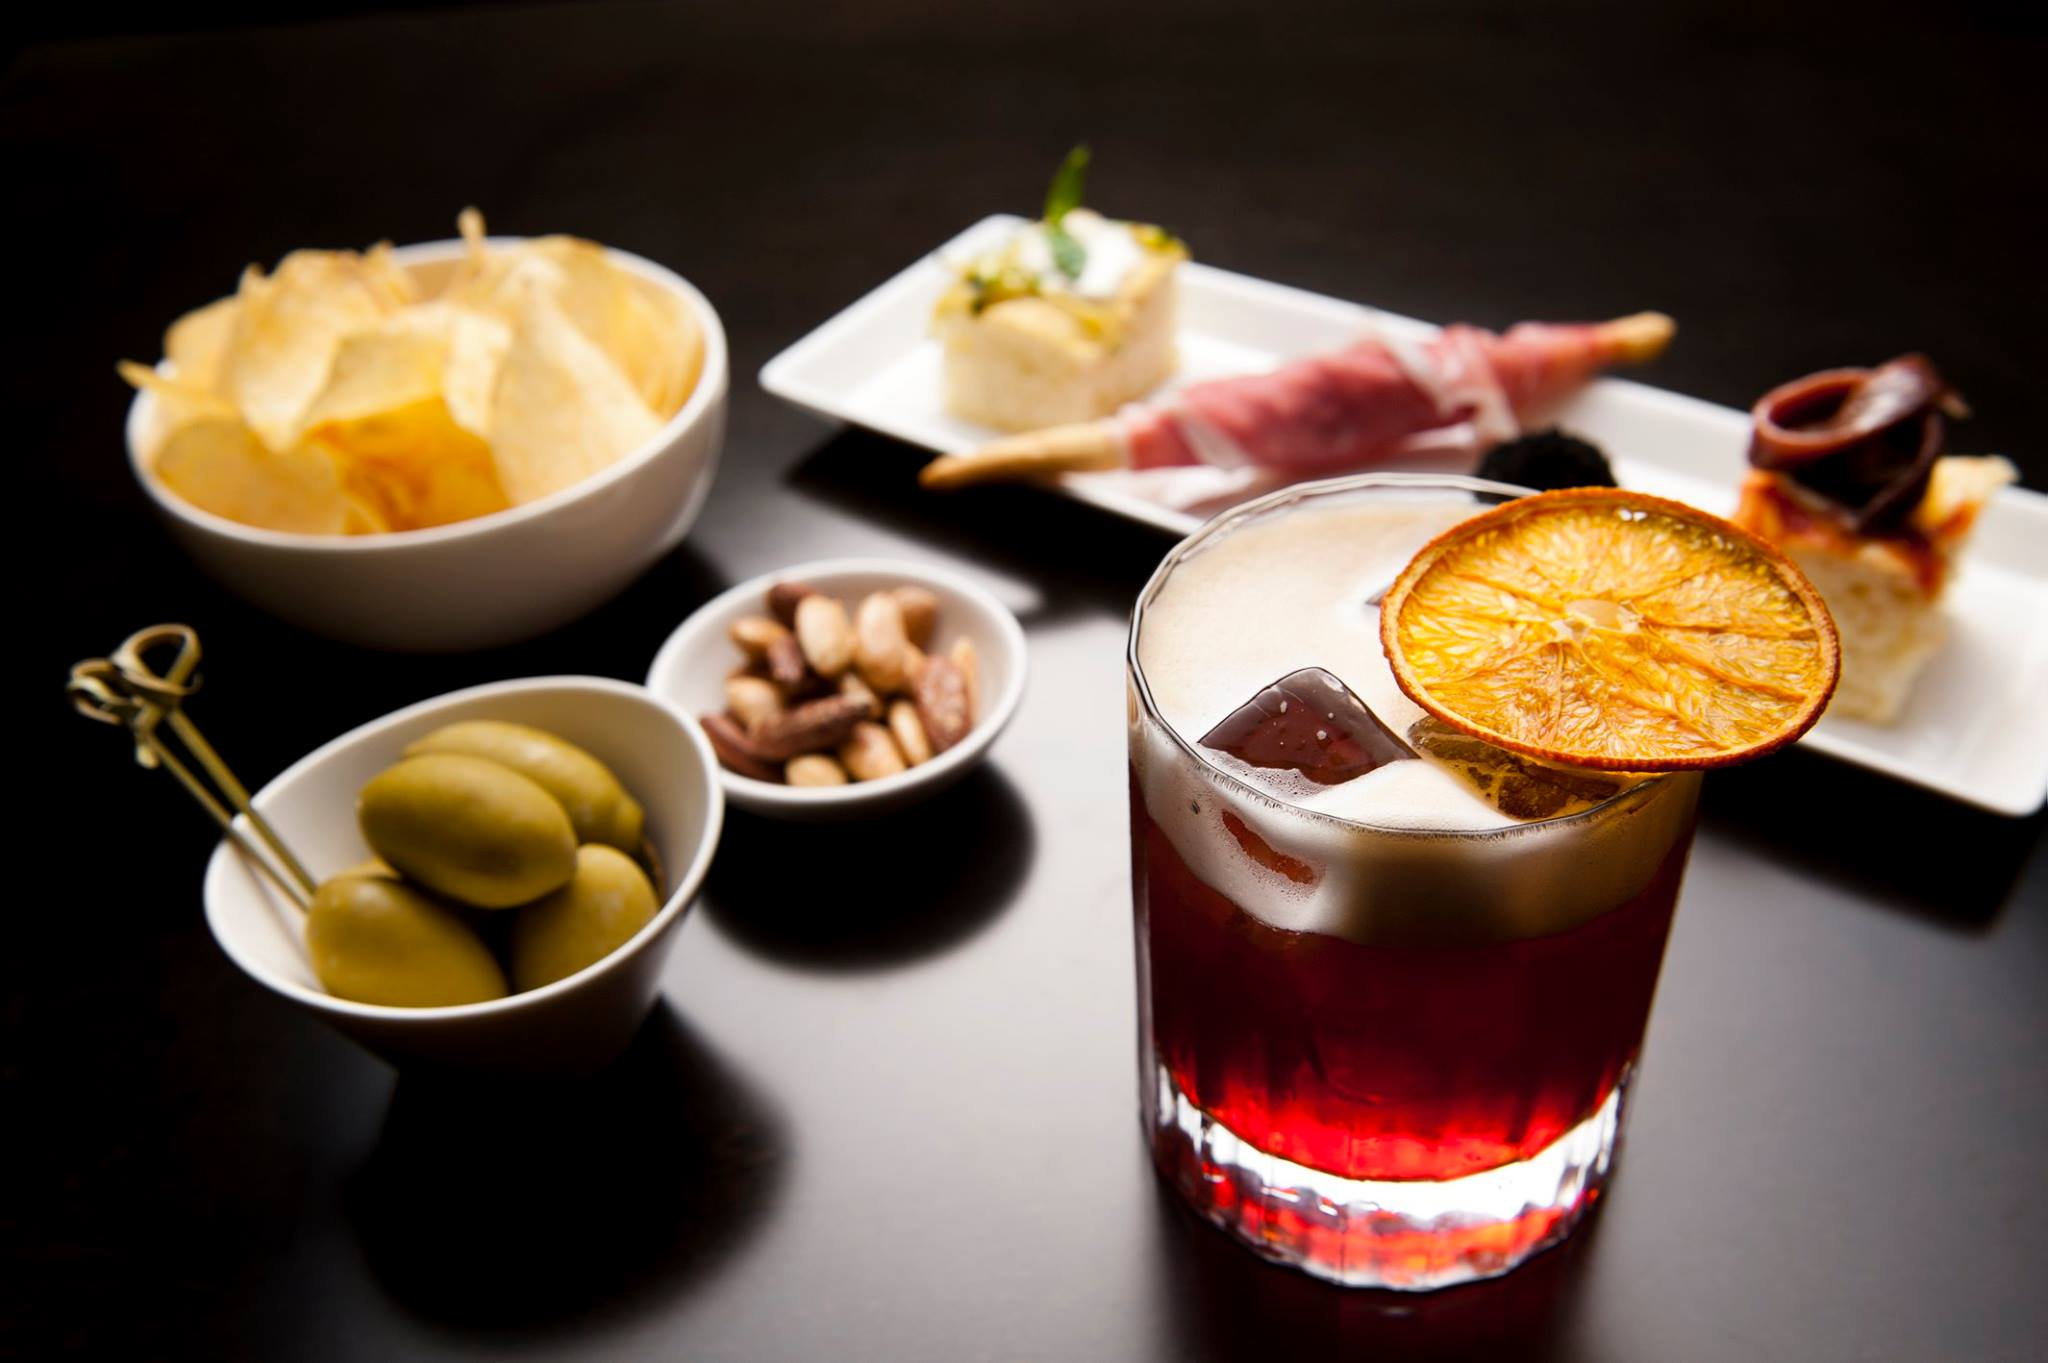 Emporio Armani Caff Bologna aperitivo e Dj set  Puntarella Rossa